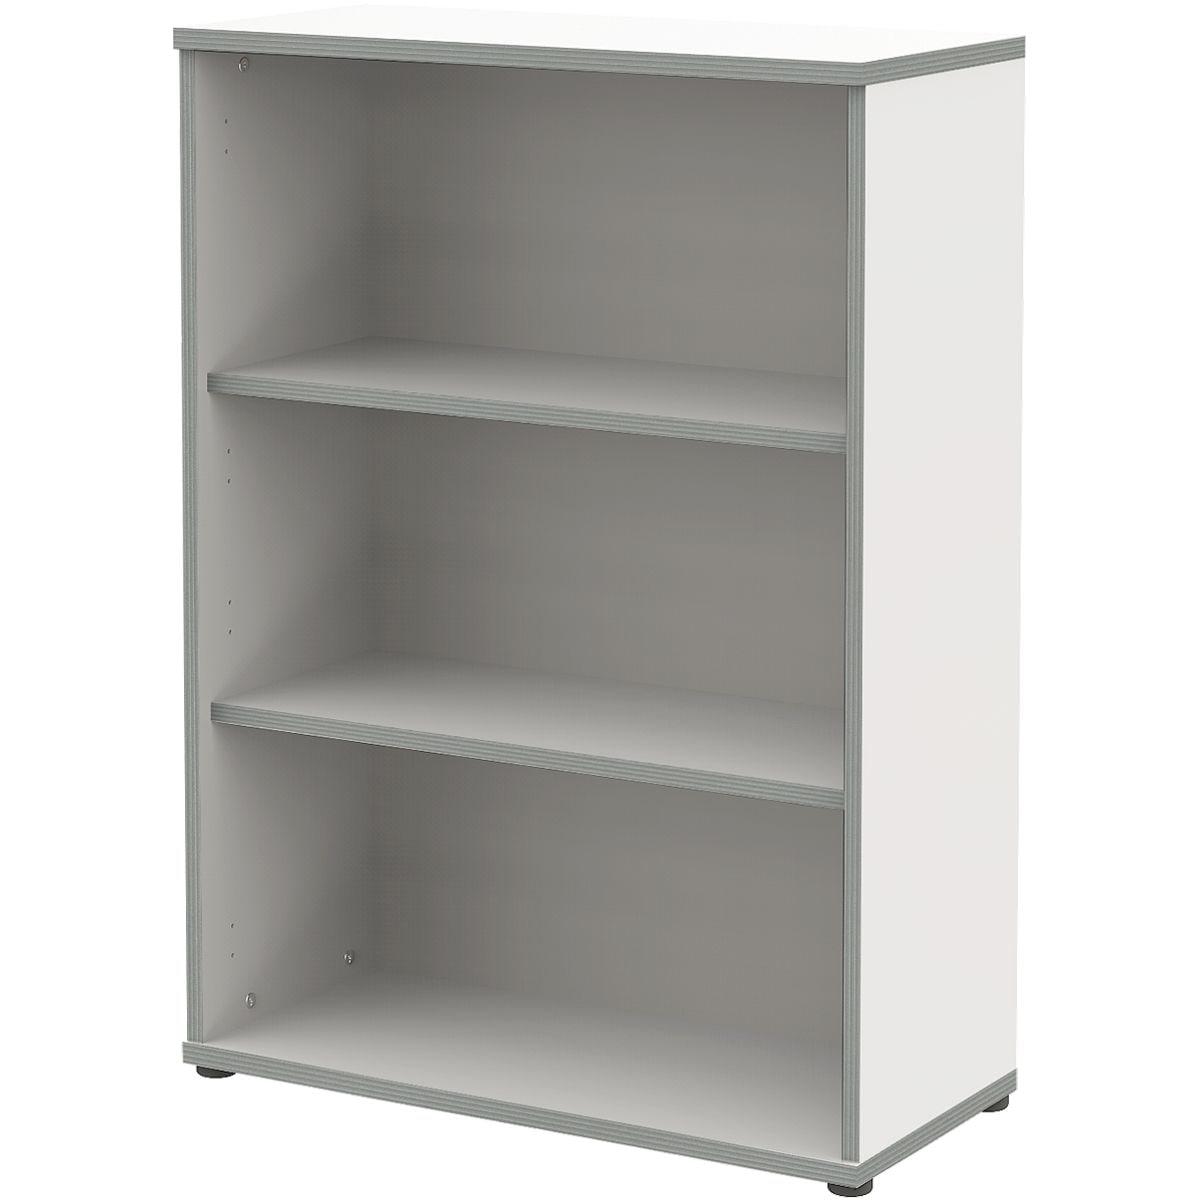 wellem bel regal alto 80 cm breit 3 oh bei otto office g nstig kaufen. Black Bedroom Furniture Sets. Home Design Ideas